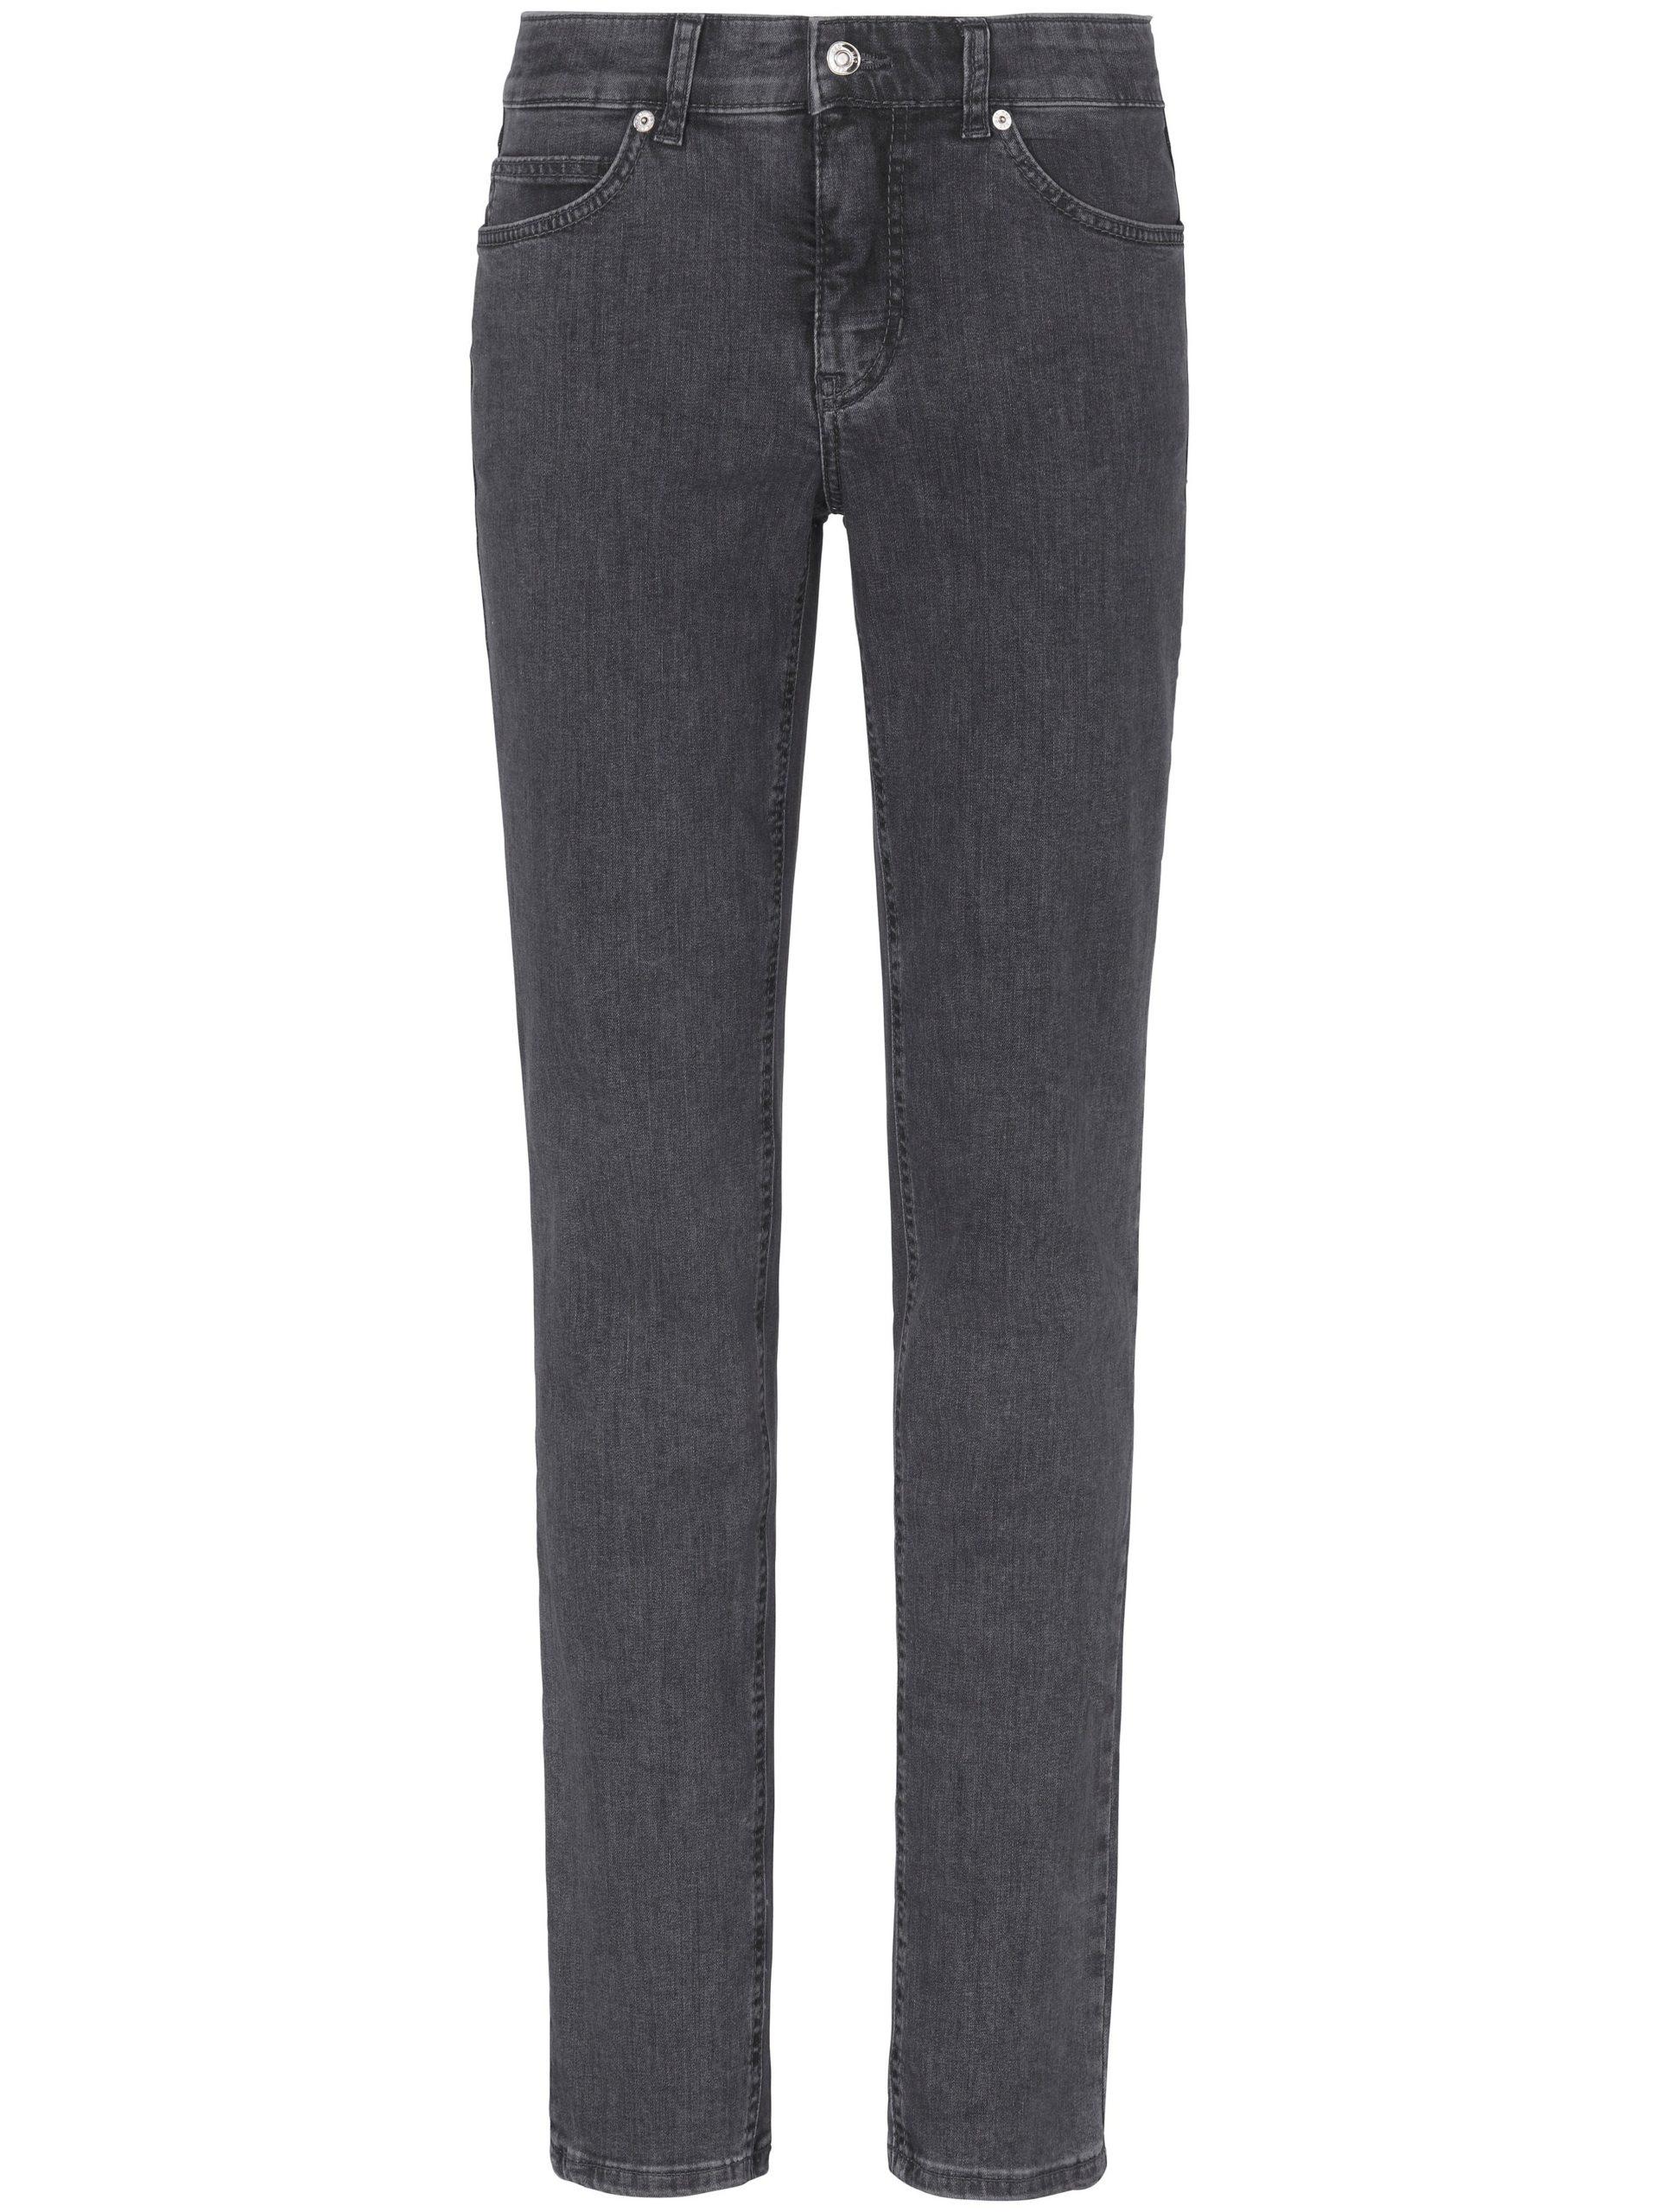 'Feminine Fit'-jeans Inch 30 Van Mac denim Kopen